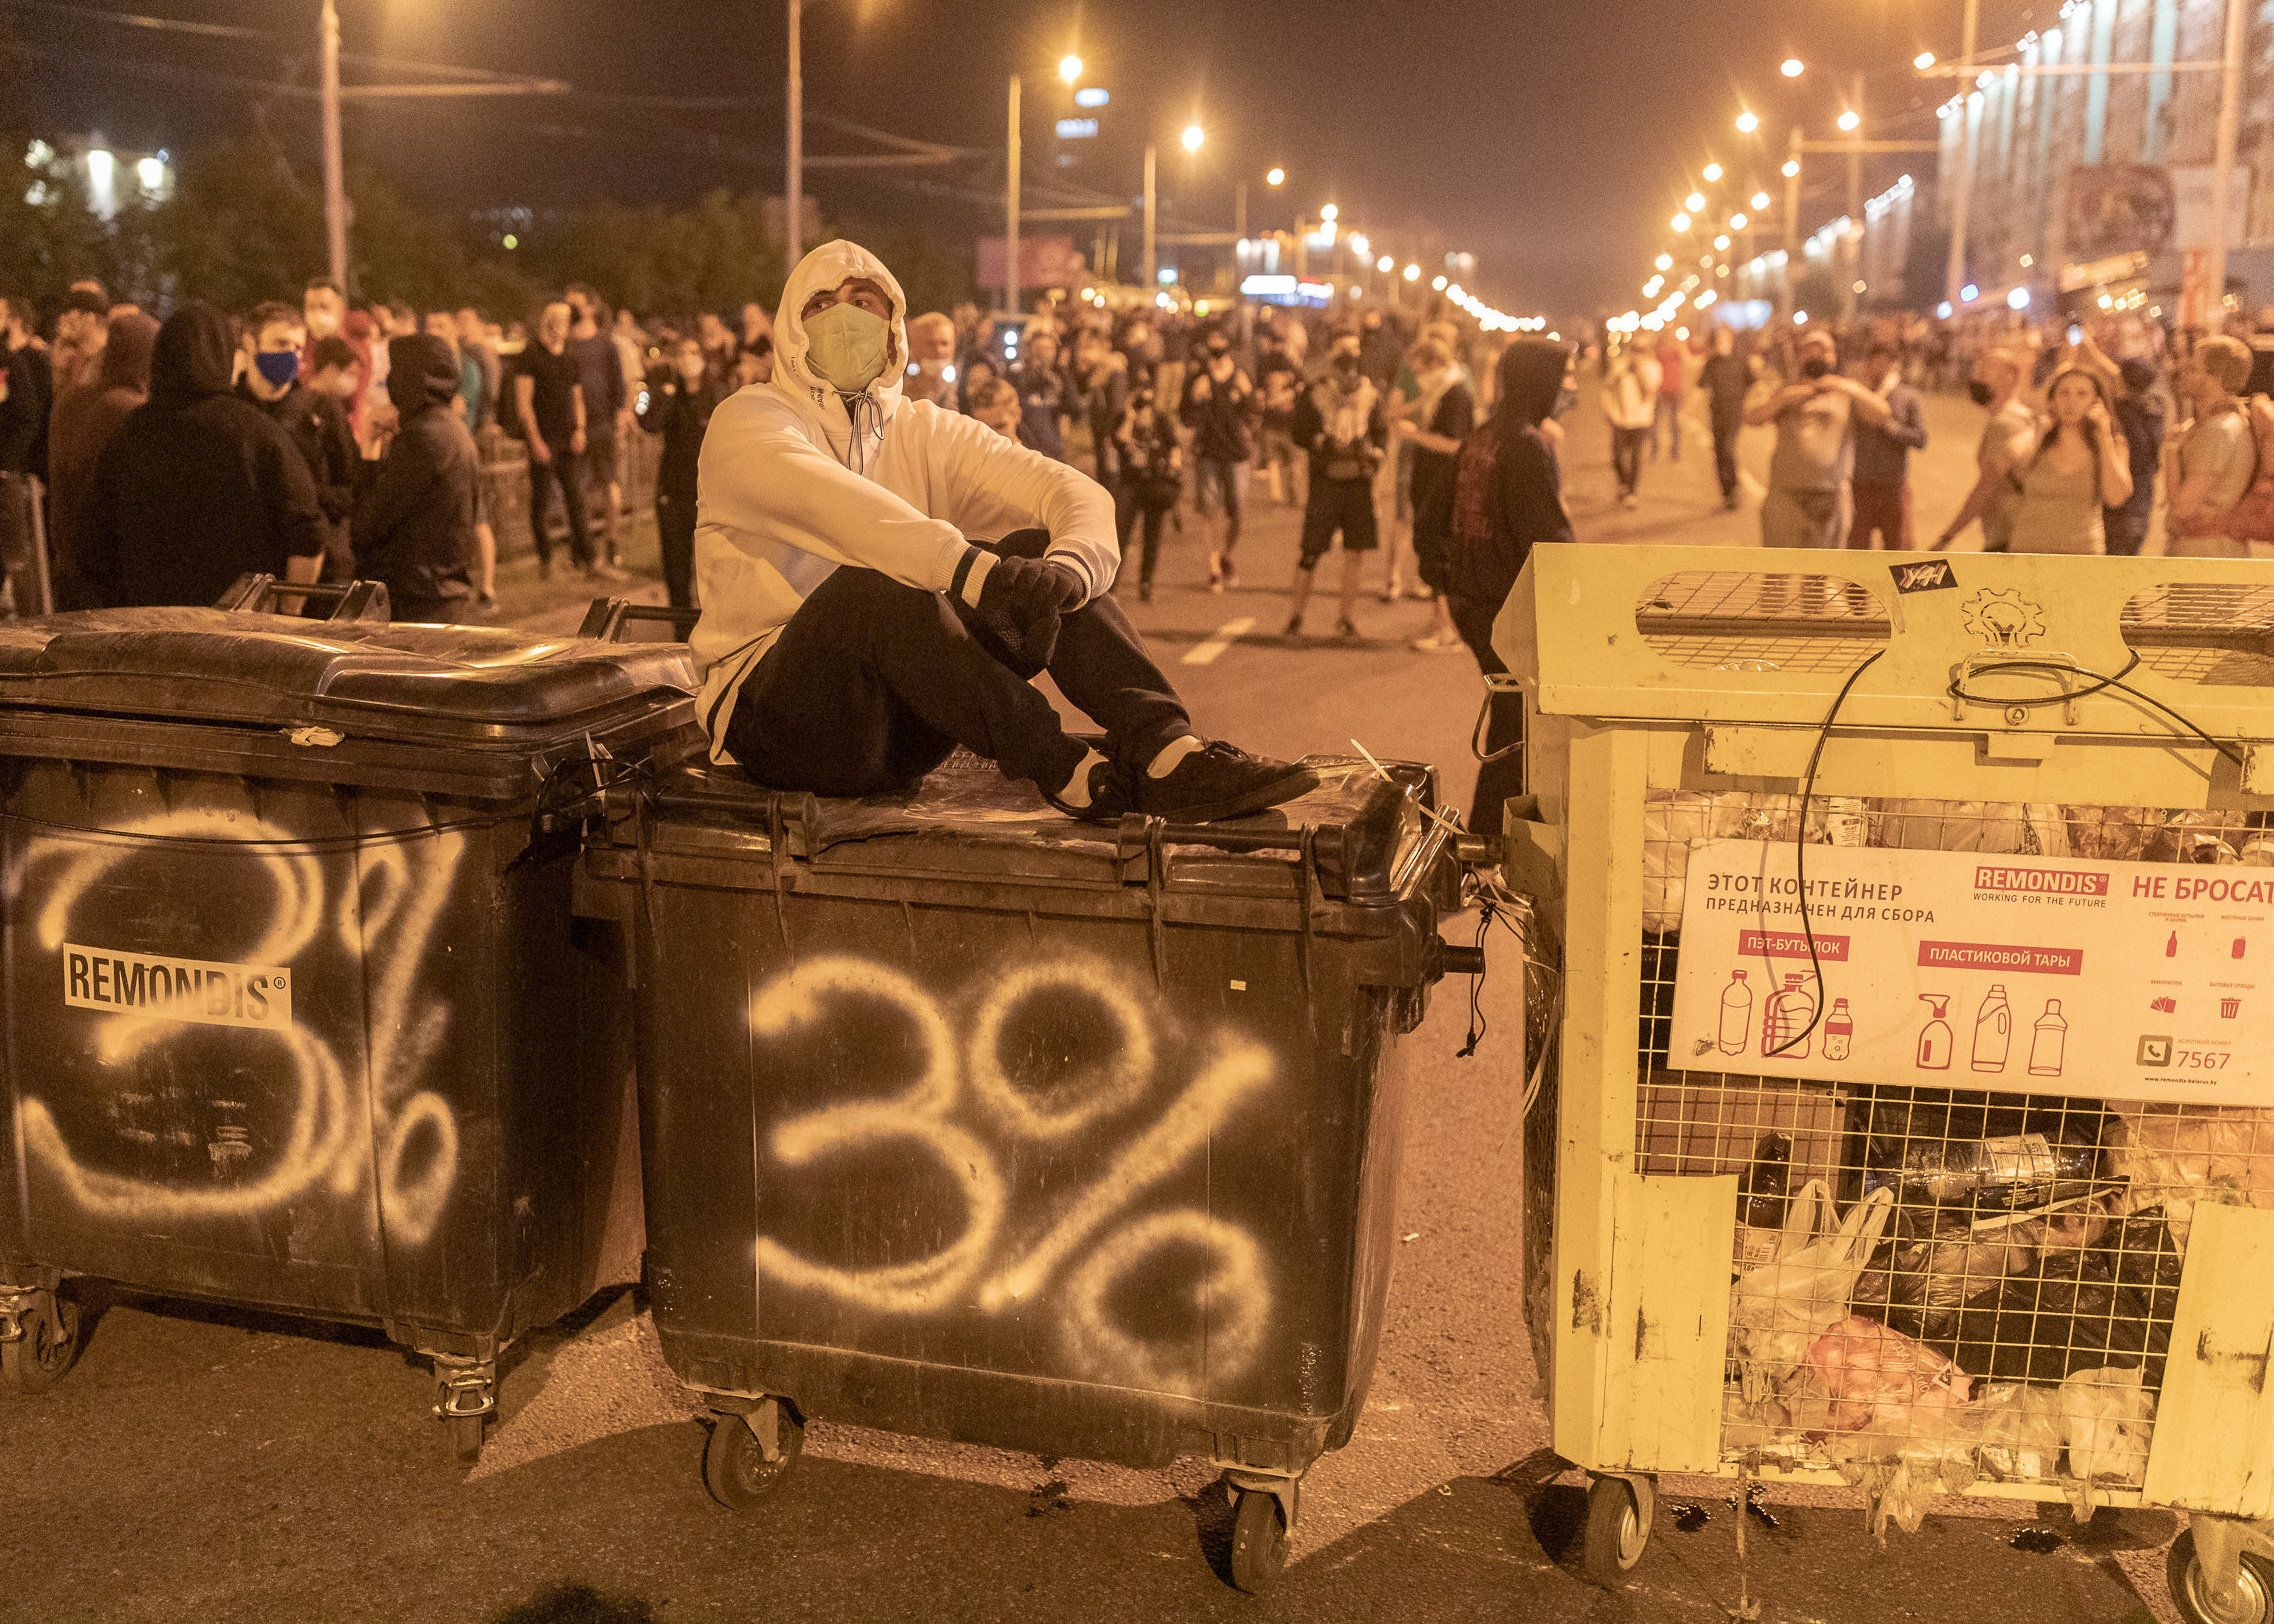 What We're Watching: Post-election chaos in Belarus, Biden taps Harris, Bolivia's roadblock